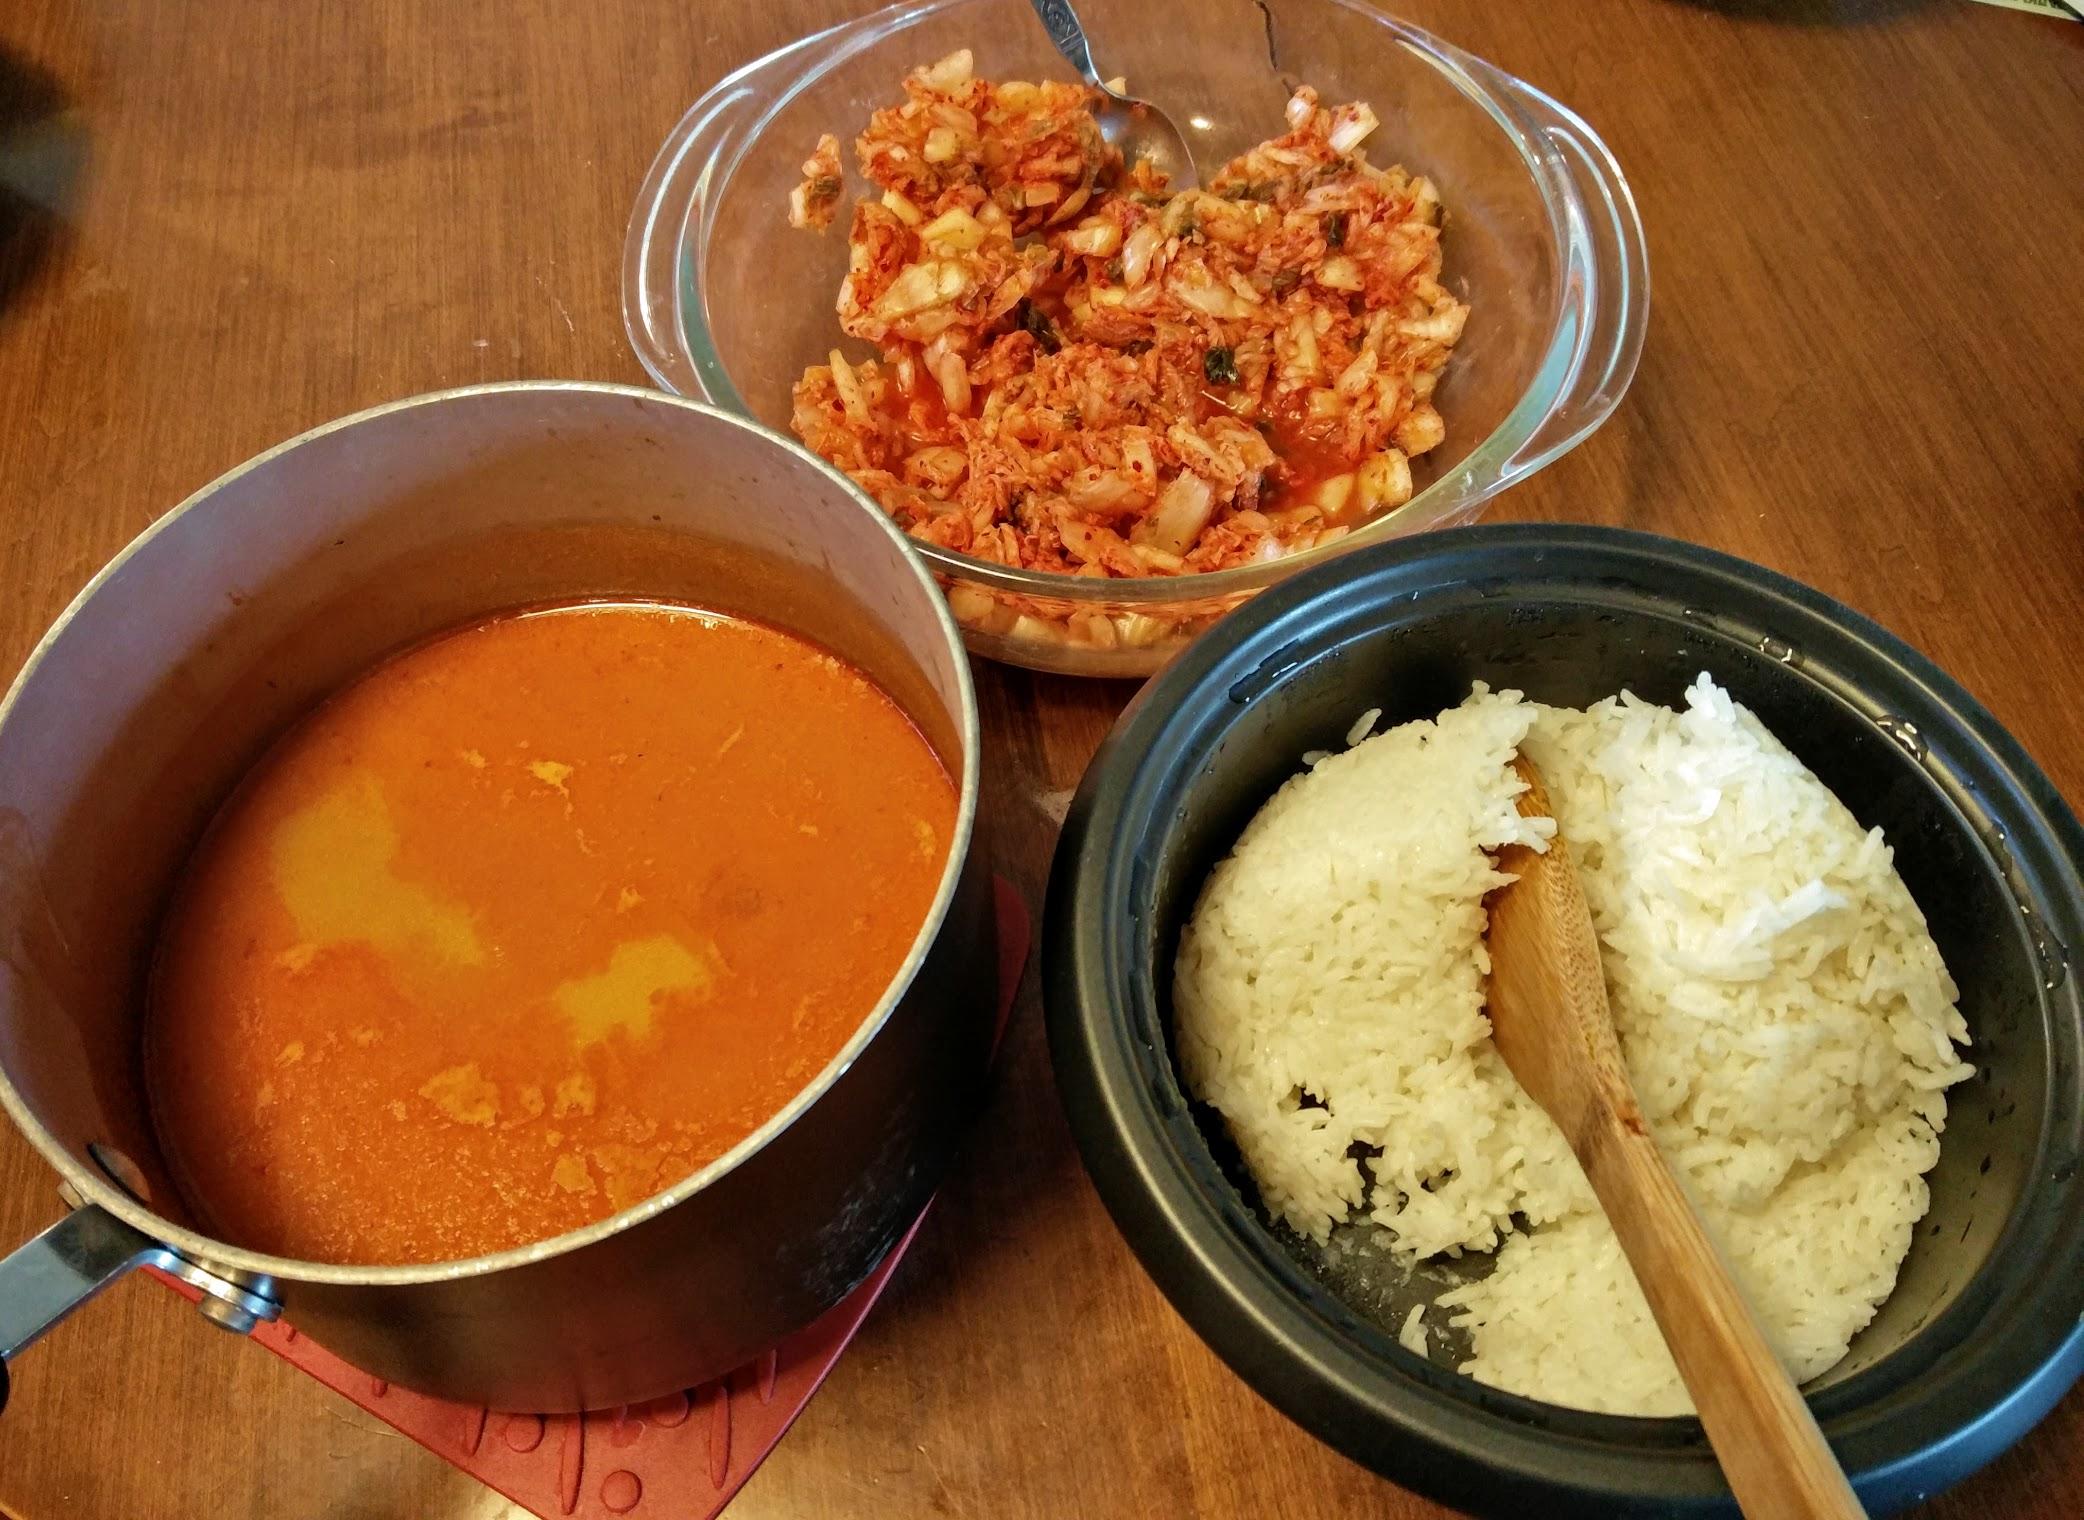 Creamy Kimchi Stew